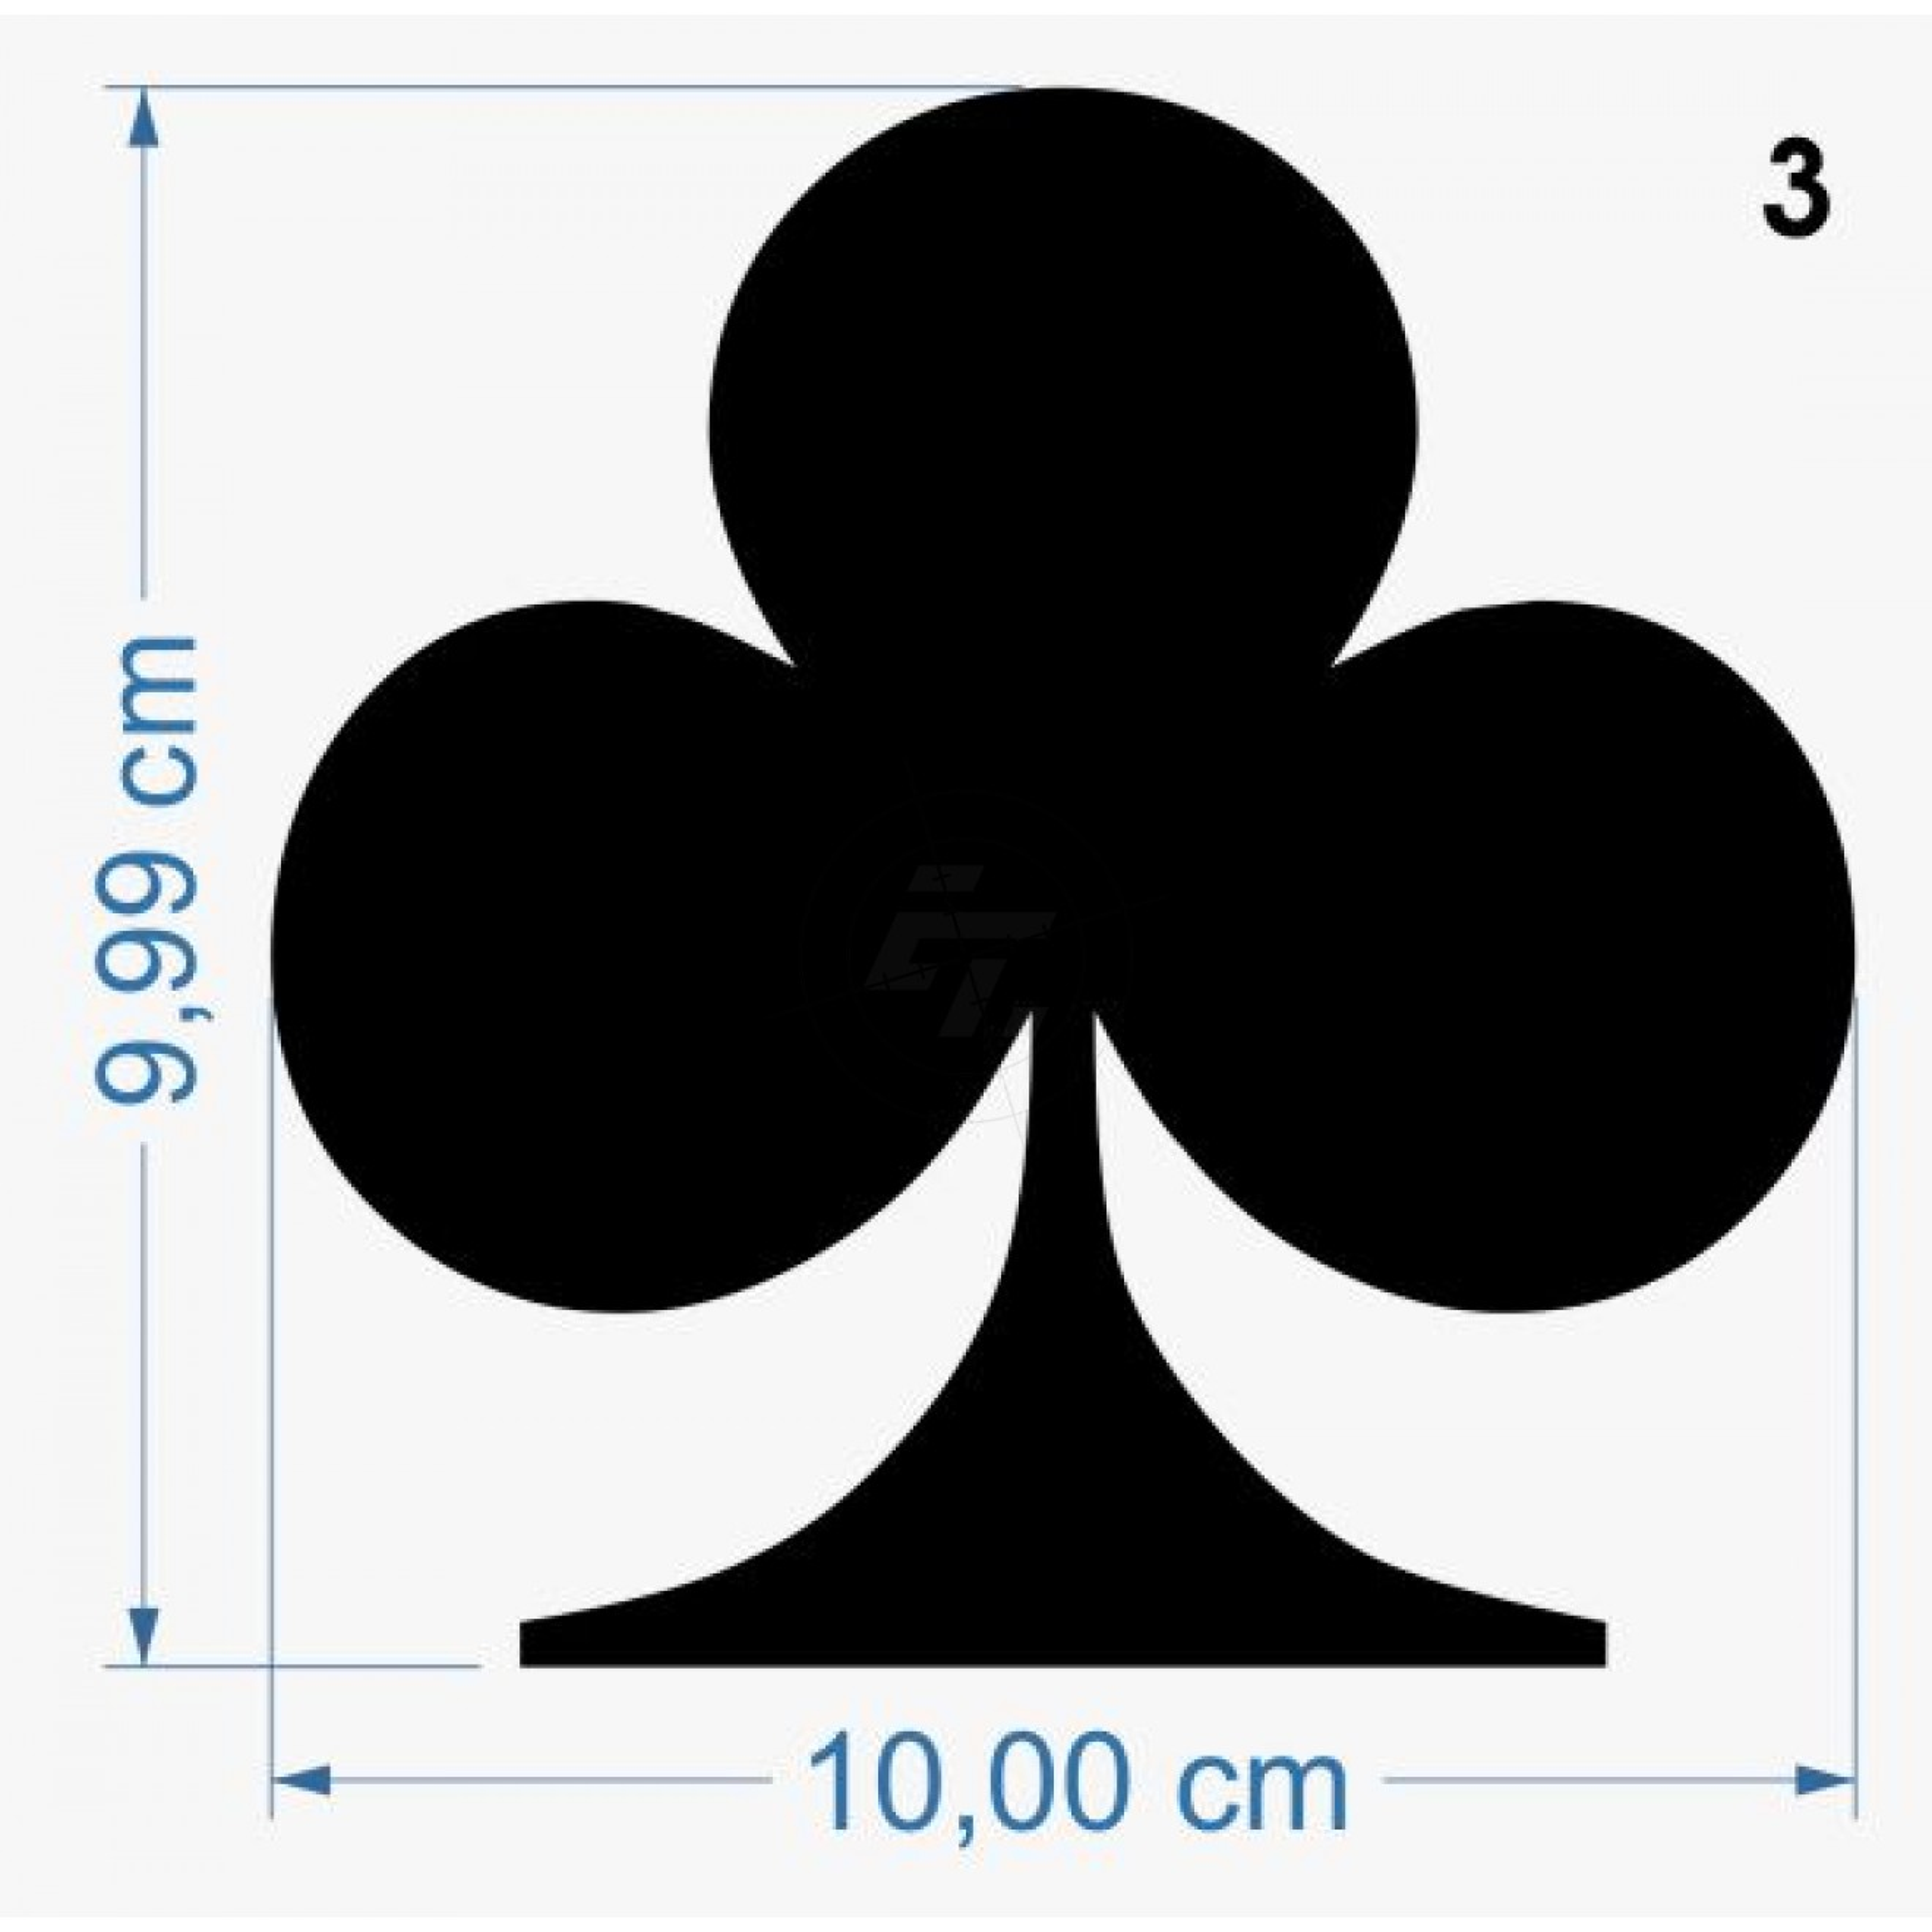 Spielkarten Symbole Bedeutung